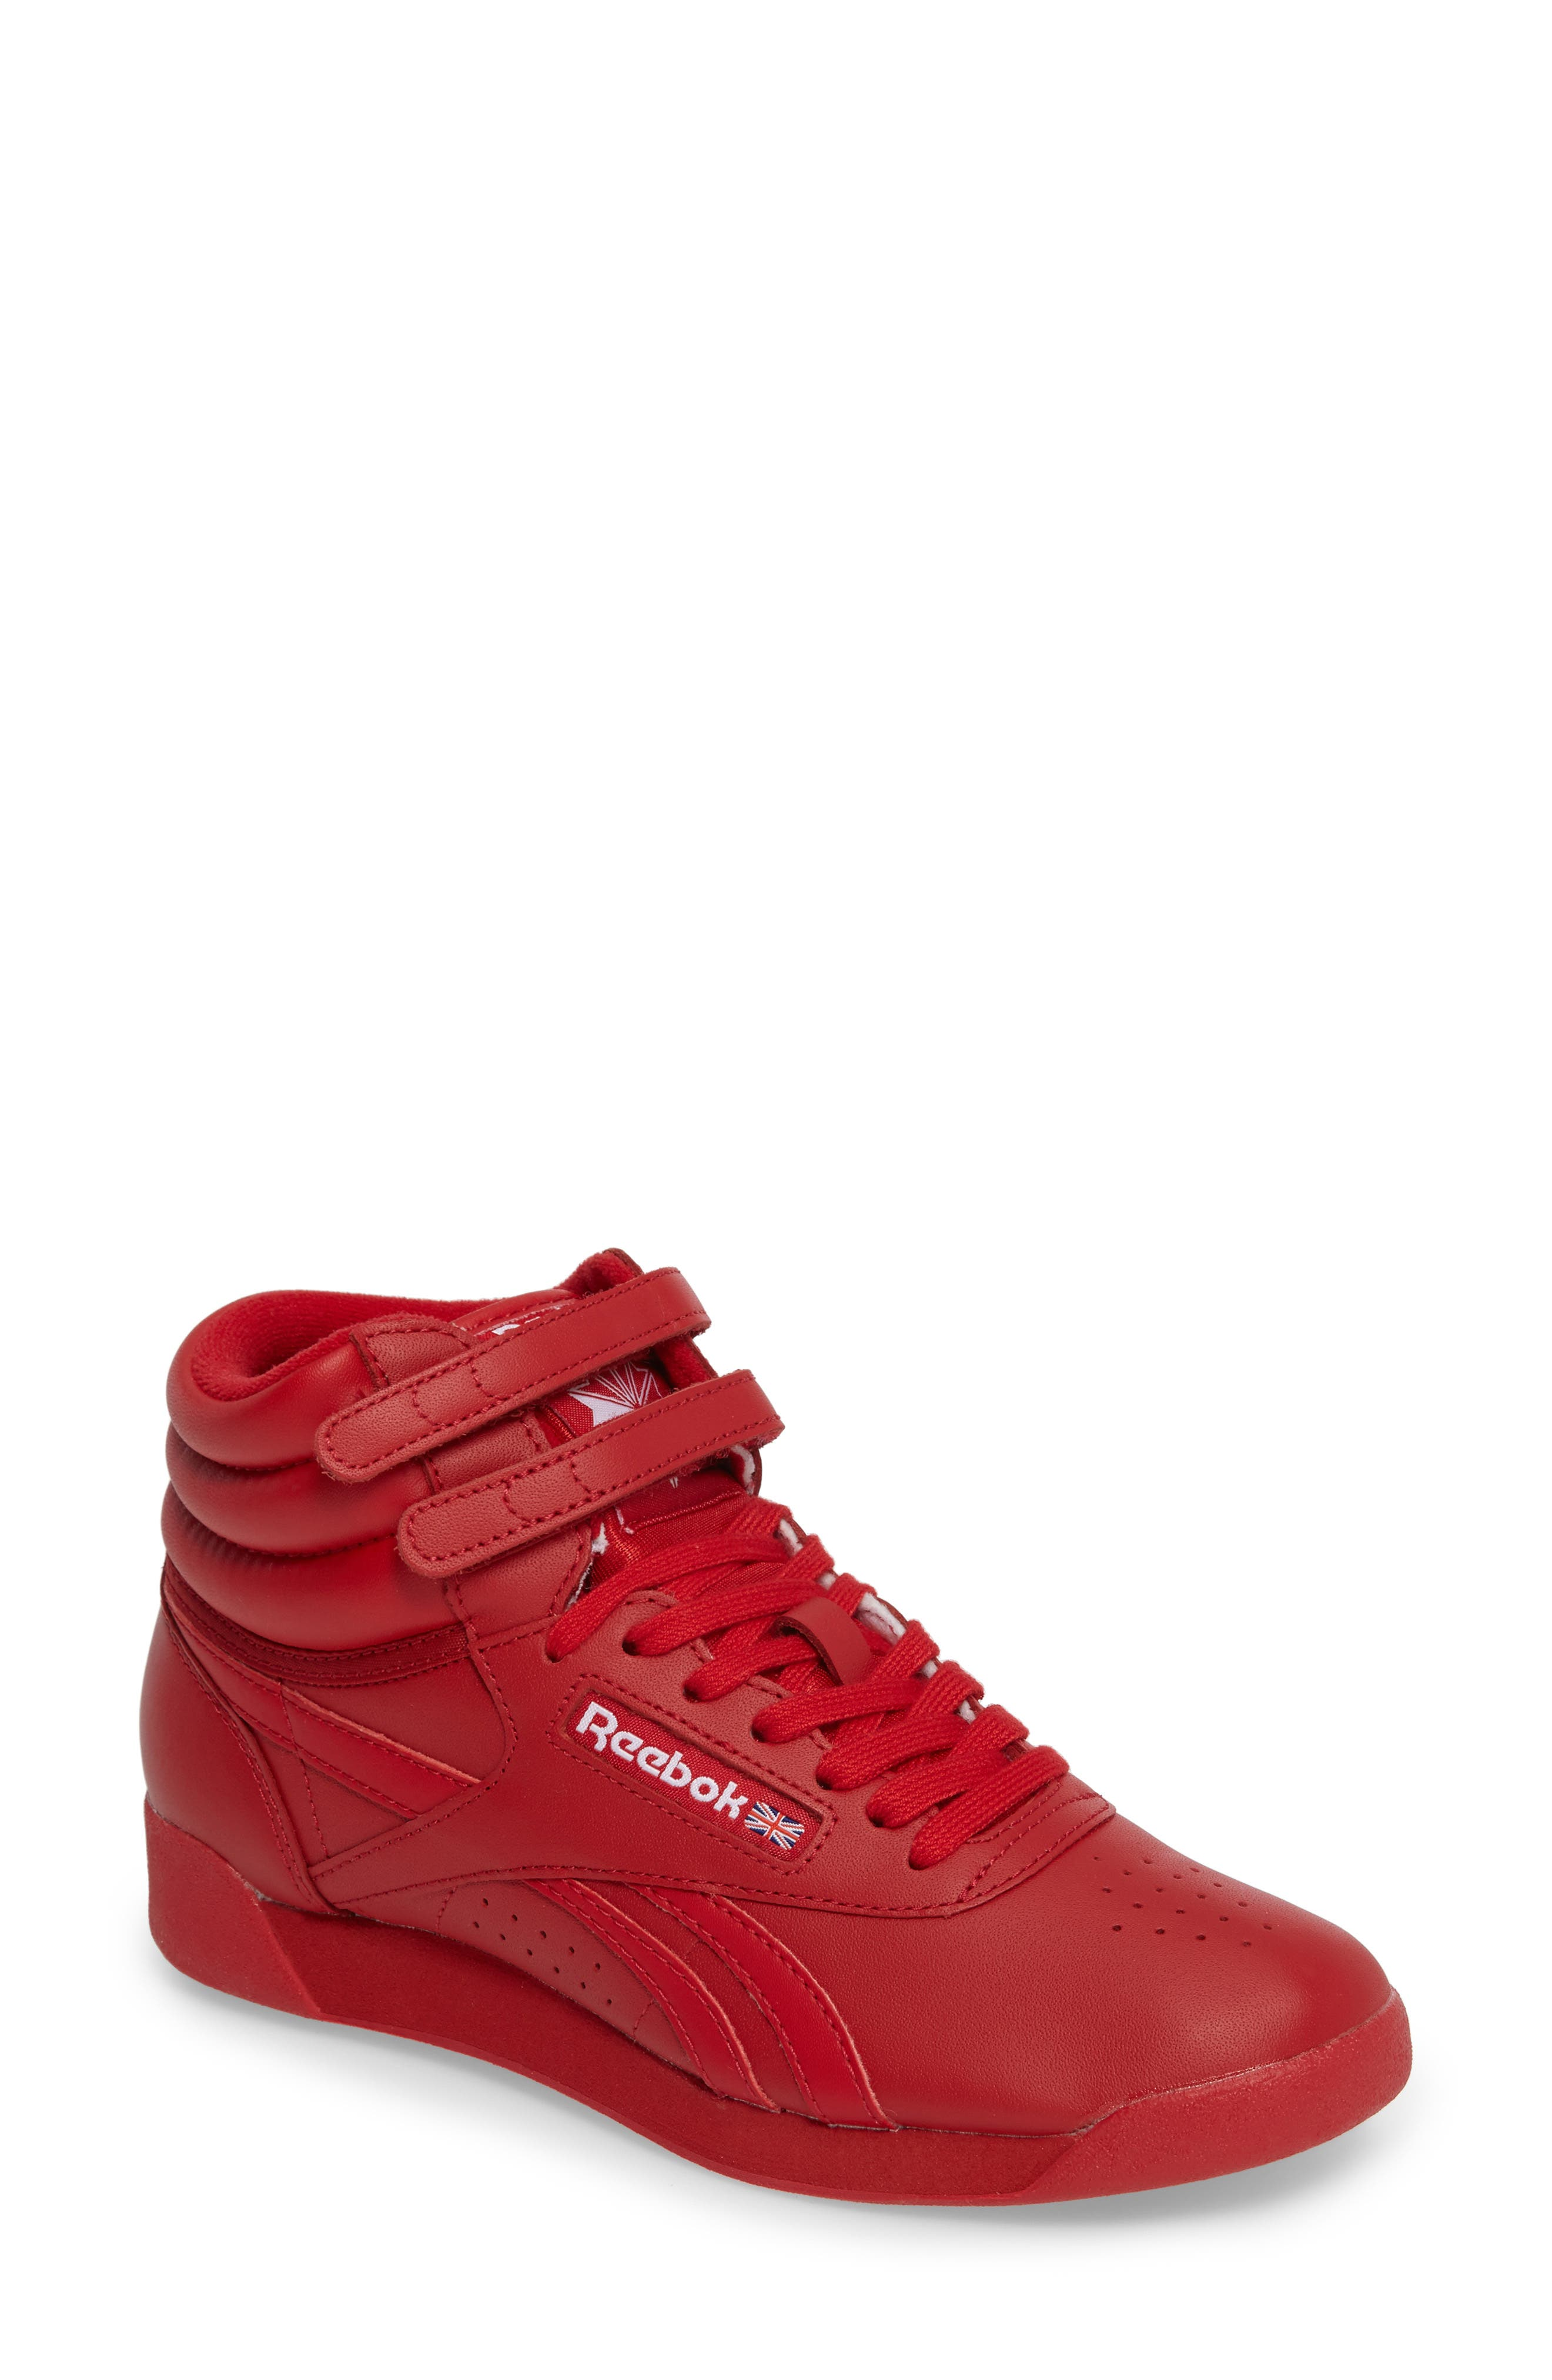 Freestyle Hi Sneaker,                             Main thumbnail 1, color,